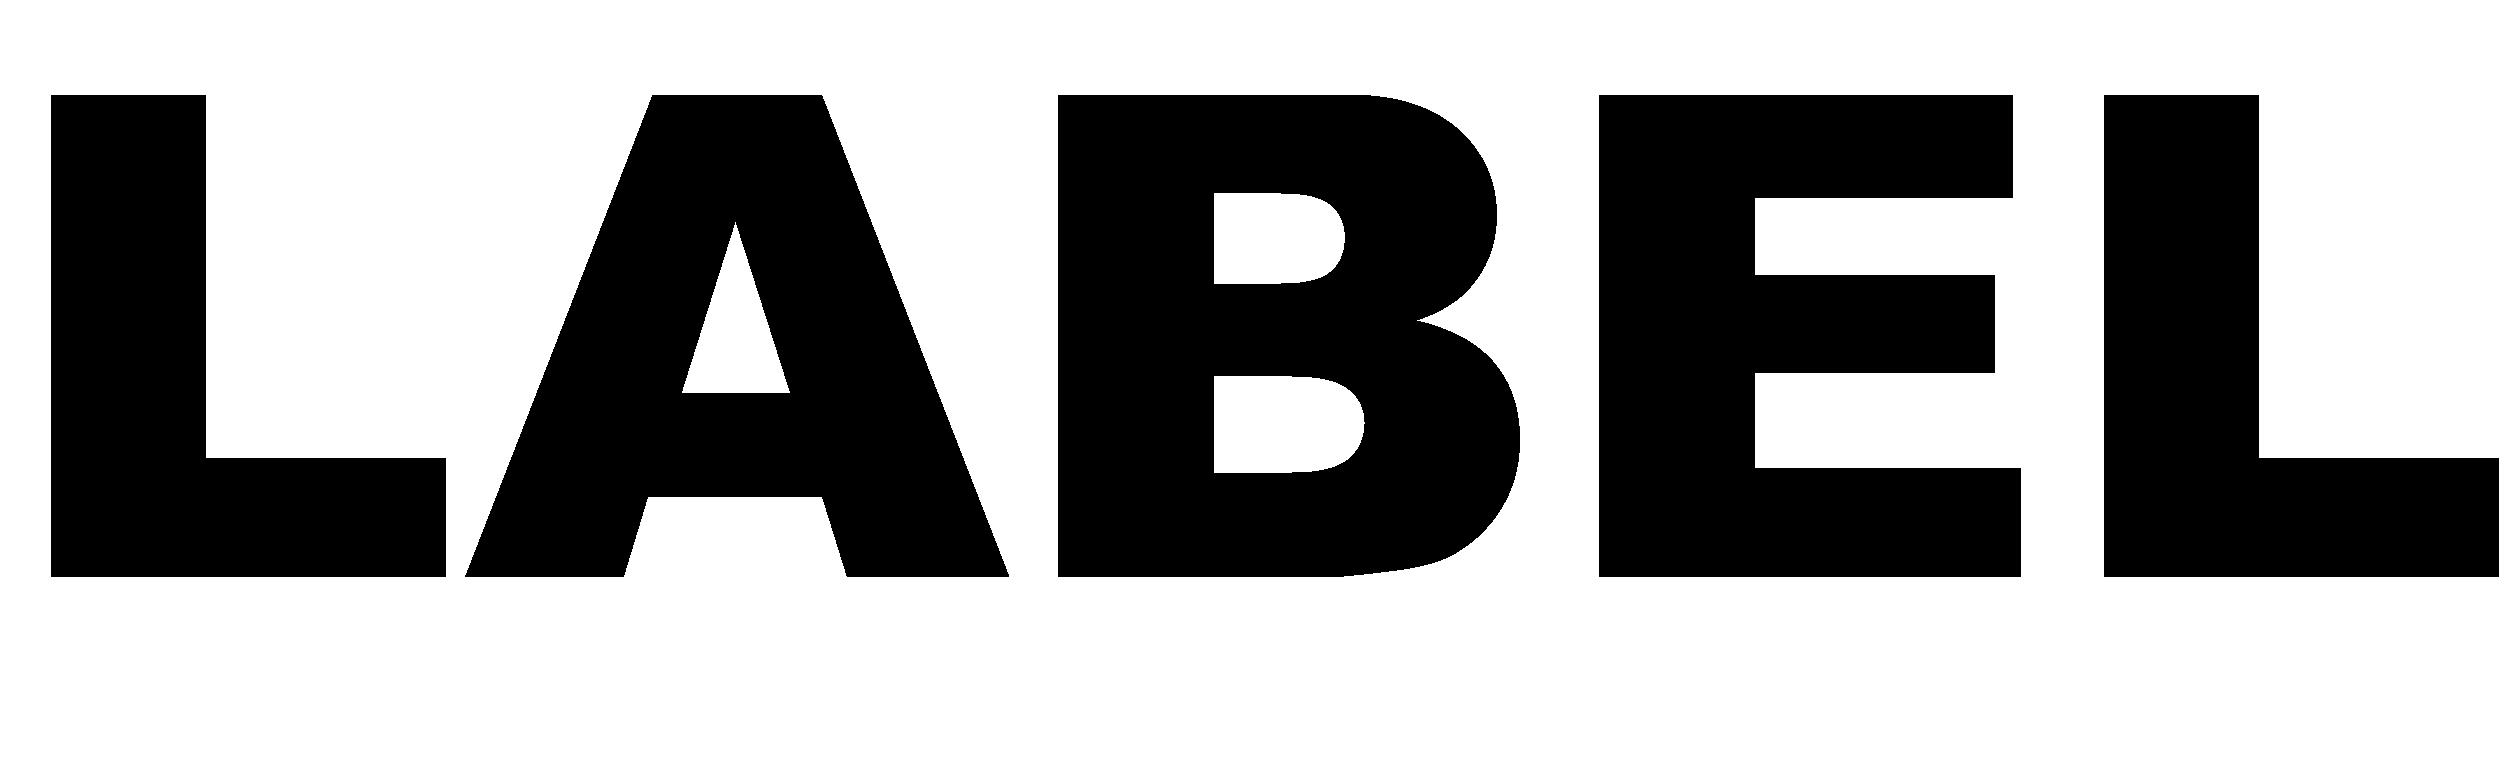 LABEL ARCHIVE 라벨 아카이브